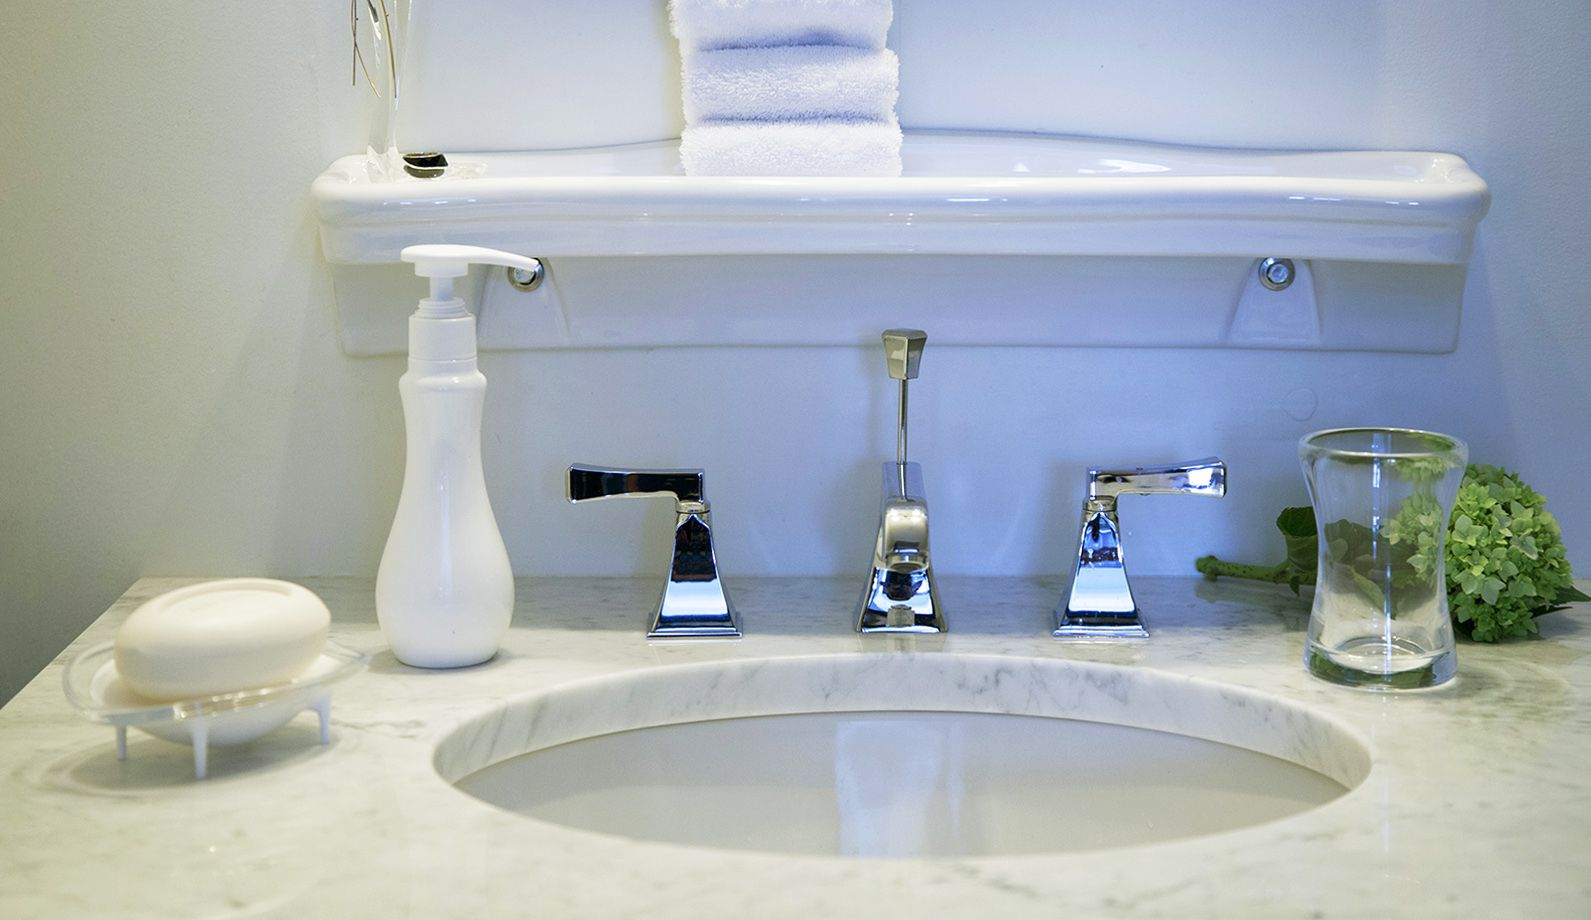 Briiith Ocean bathroom accessories set,Clear | Bathroom accessories ...